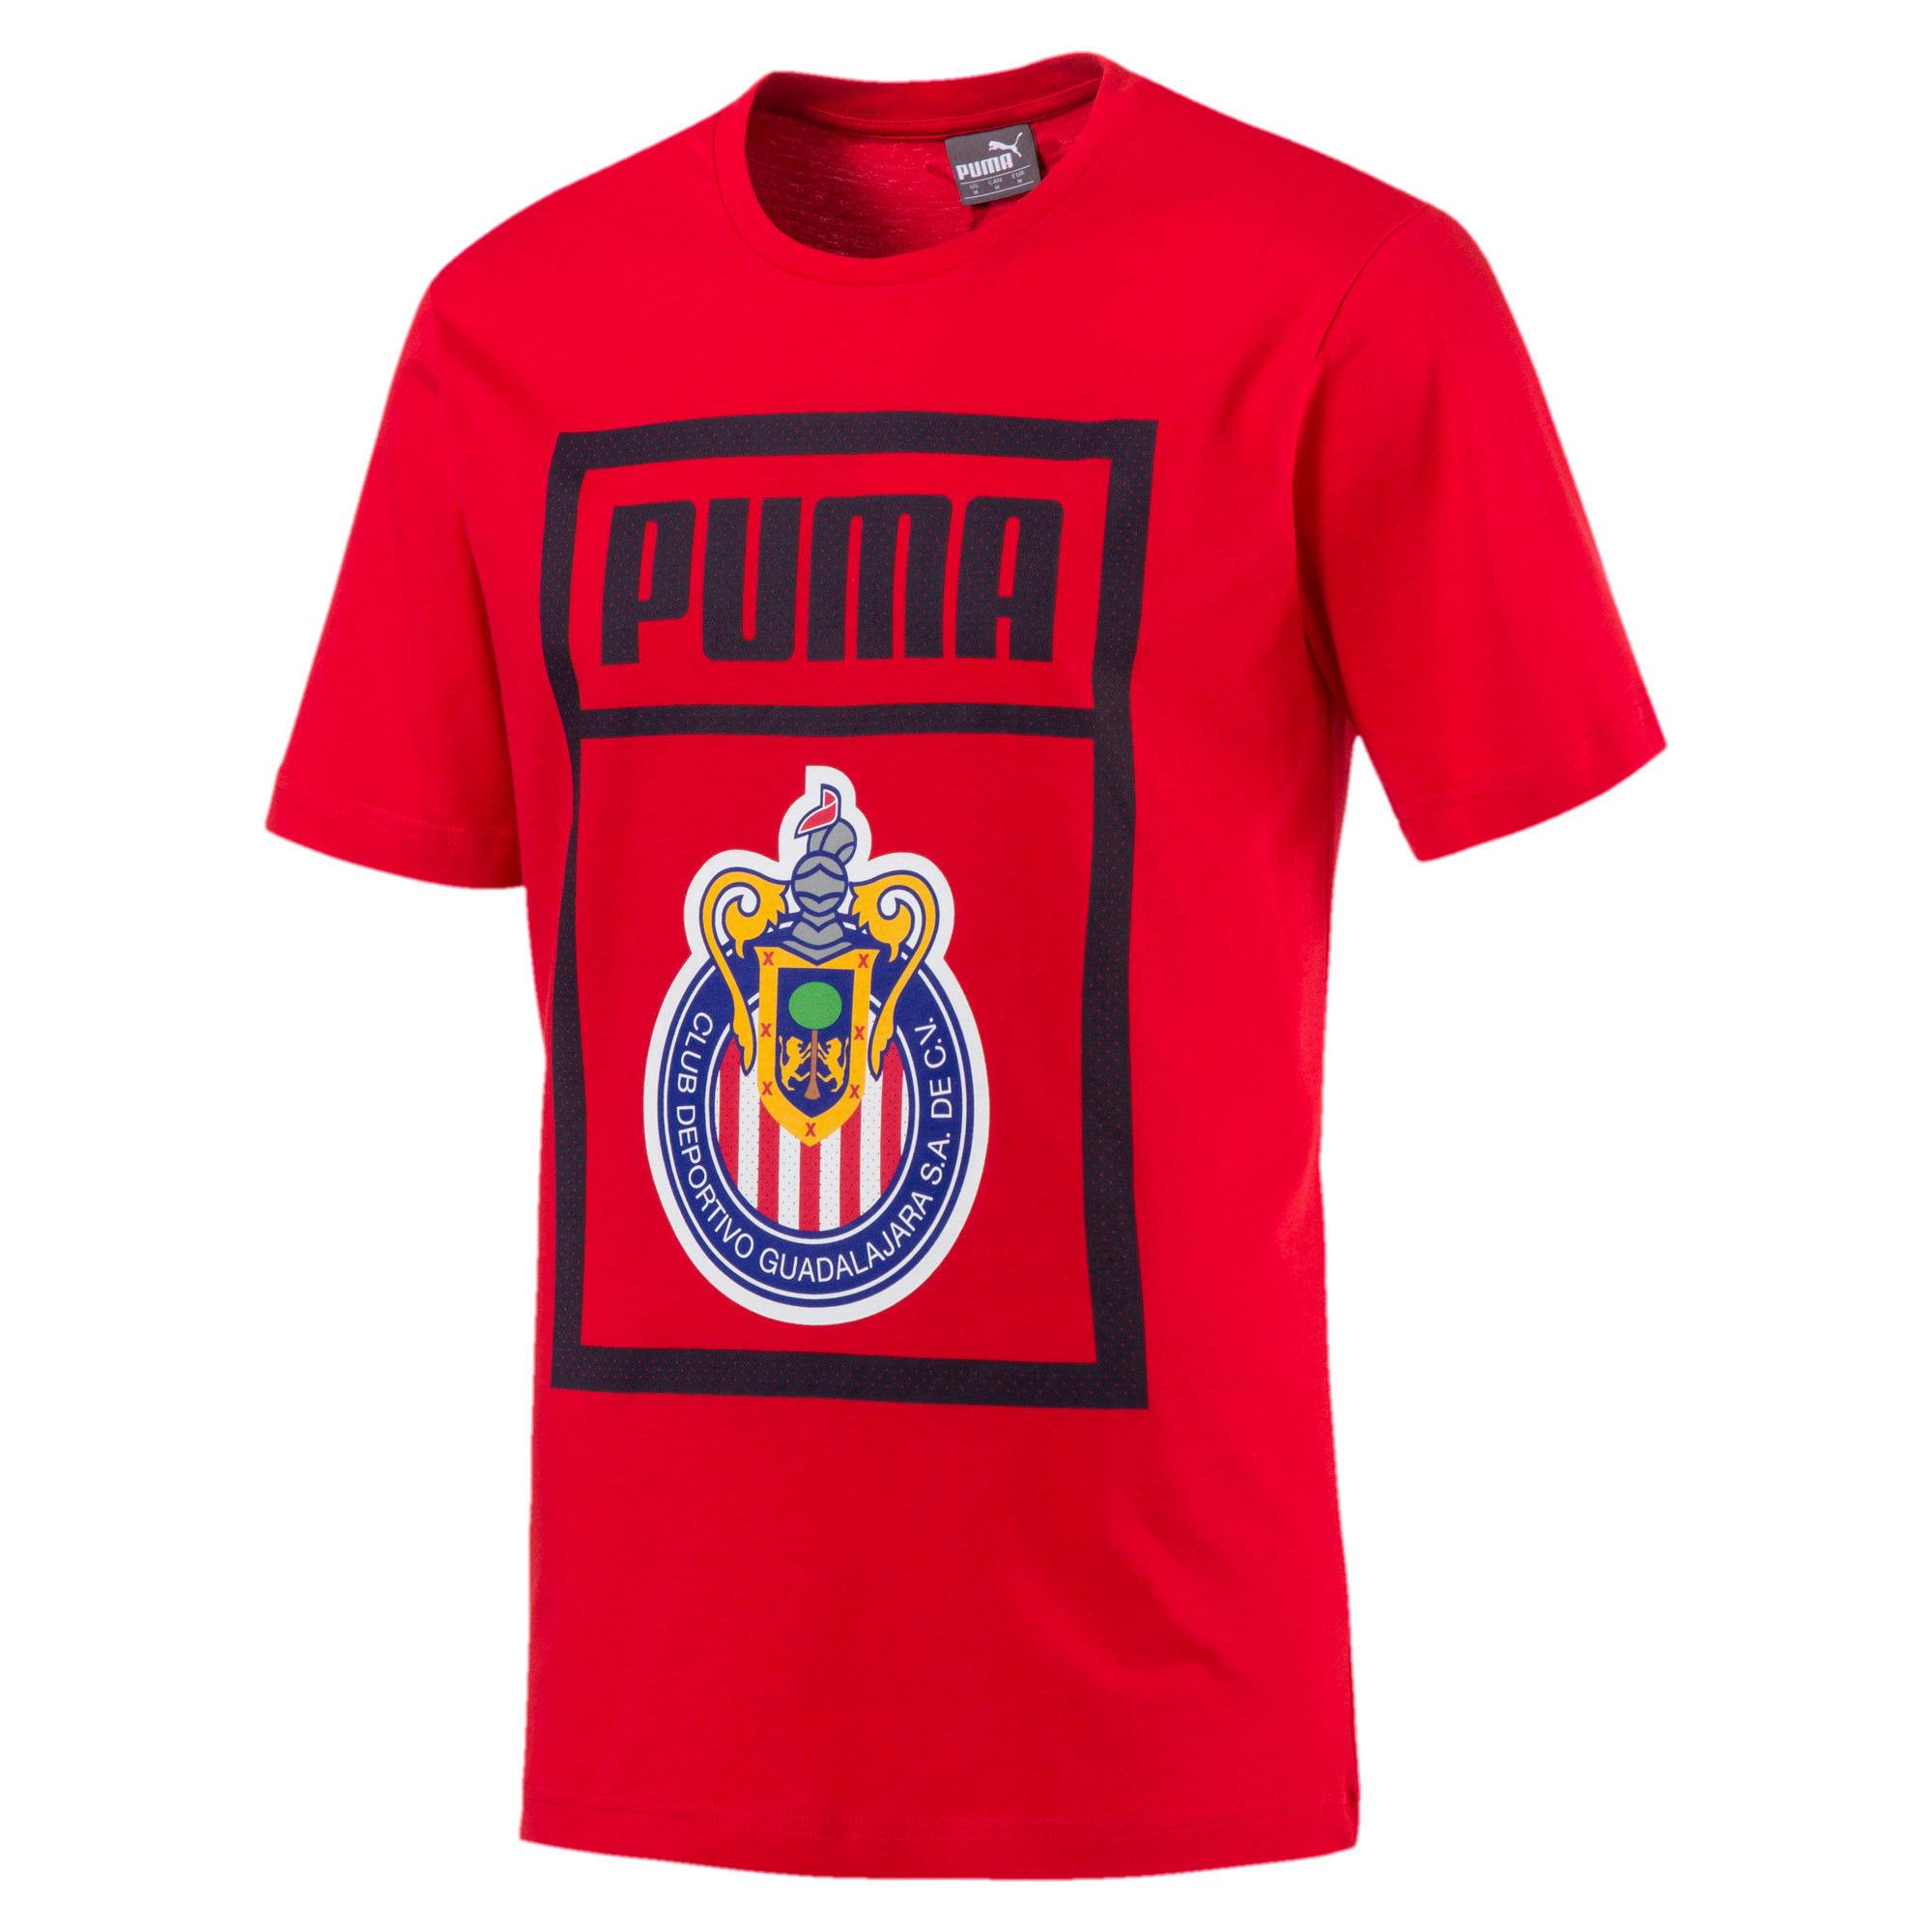 Thumbnail 1 of Chivas Men Tee, Puma Red, medium